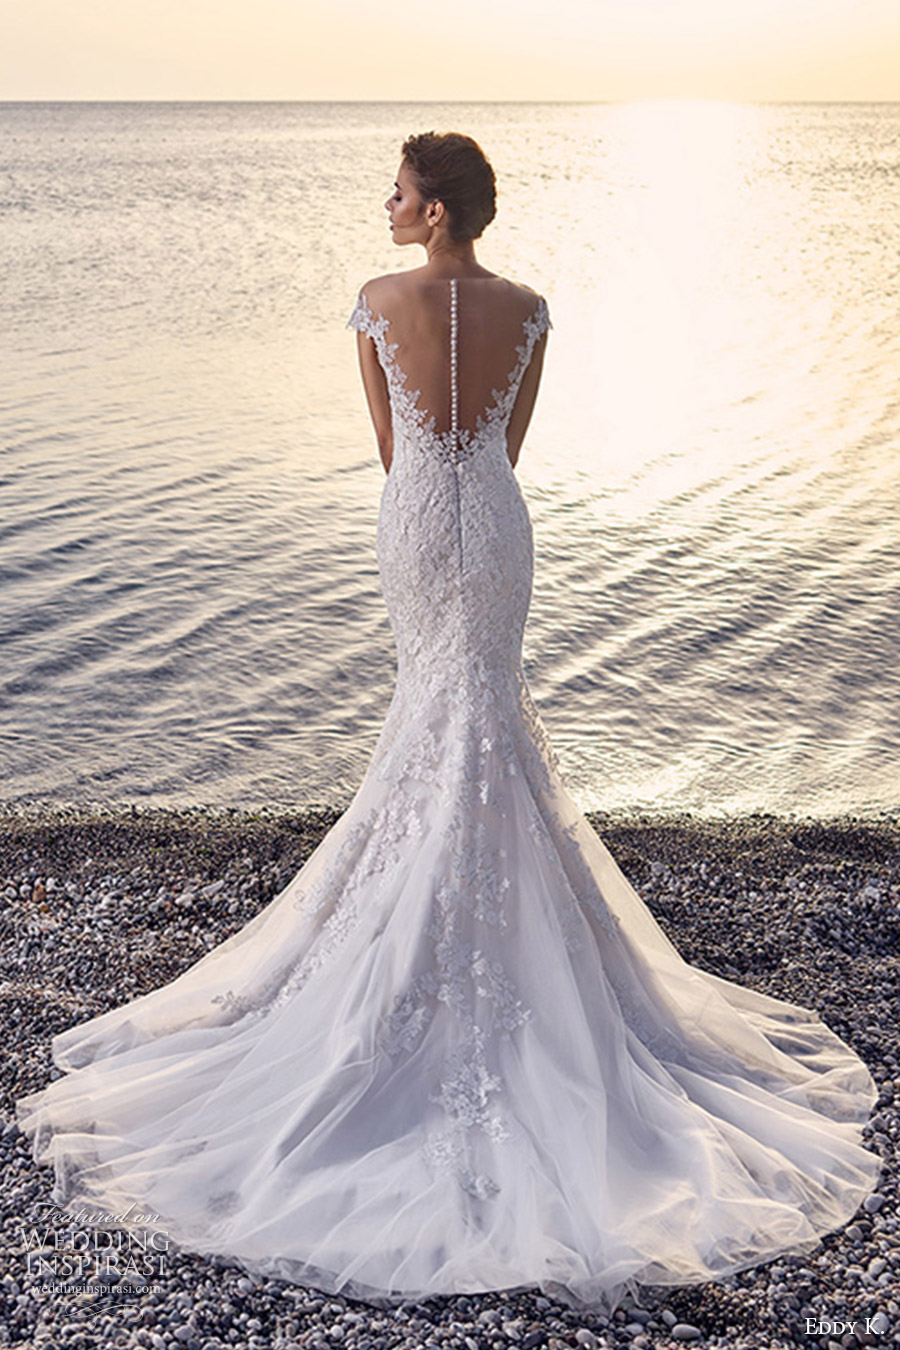 Eddy K 2017 Wedding Dresses  Dreams Bridal Collection  Wedding Inspirasi